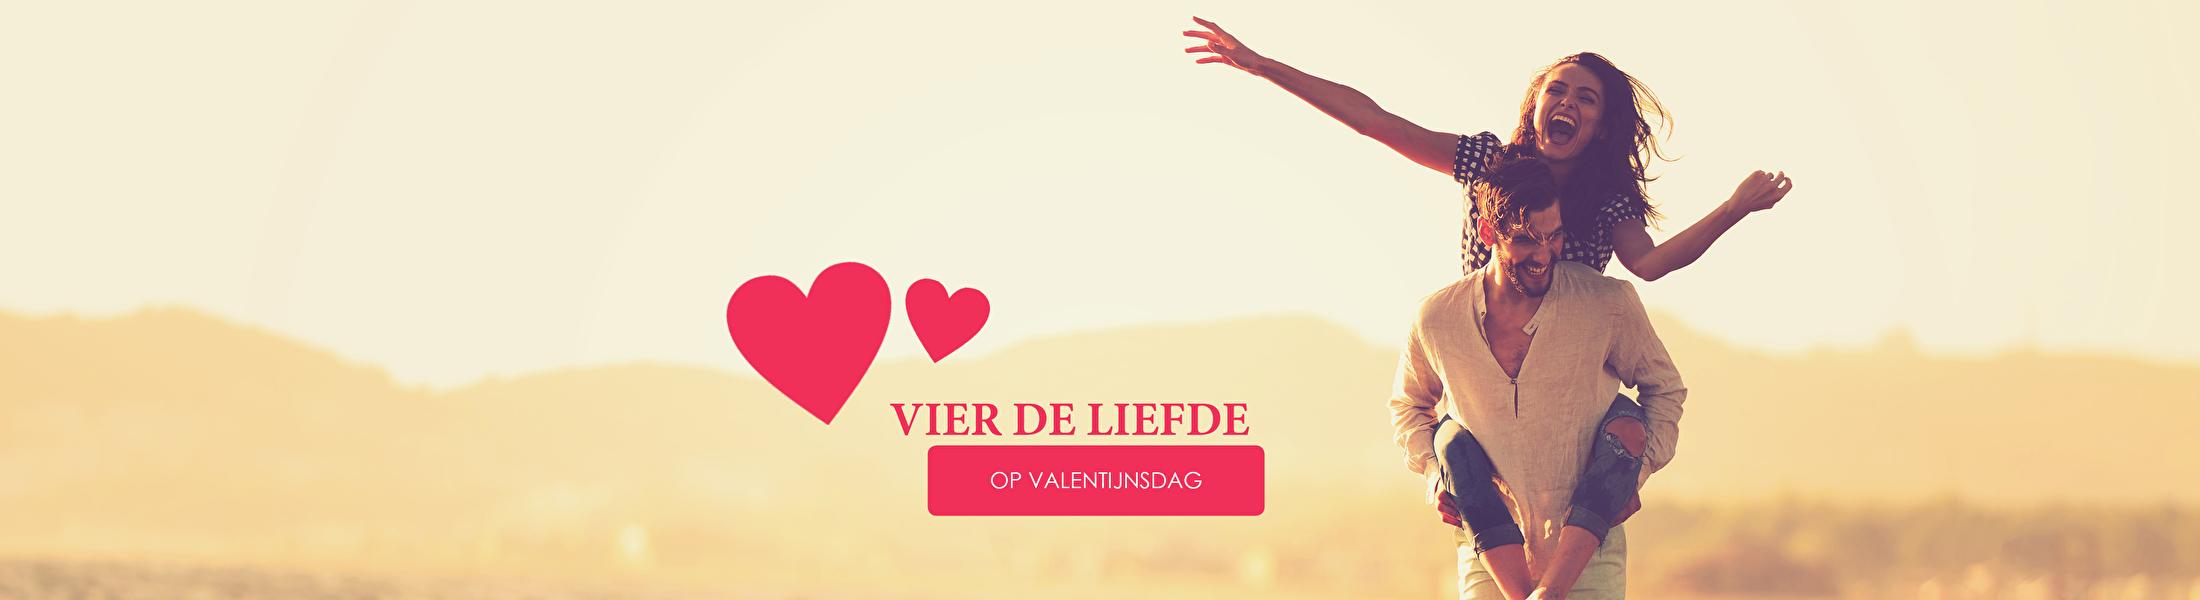 Valentijnsdag2019